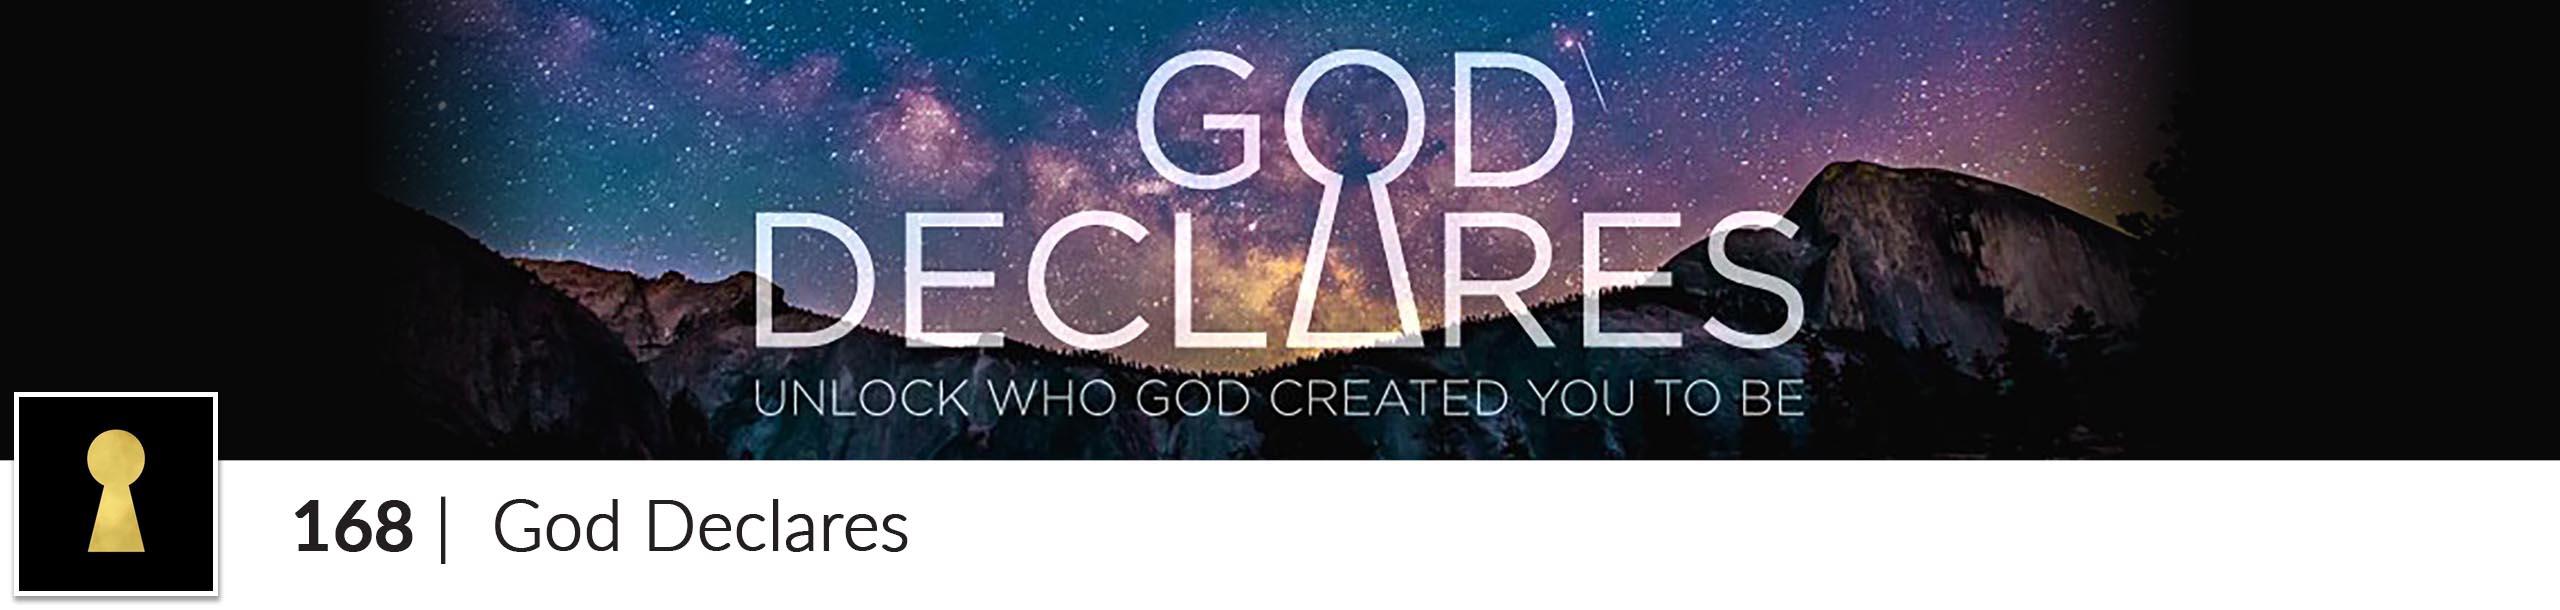 god_declares-header01